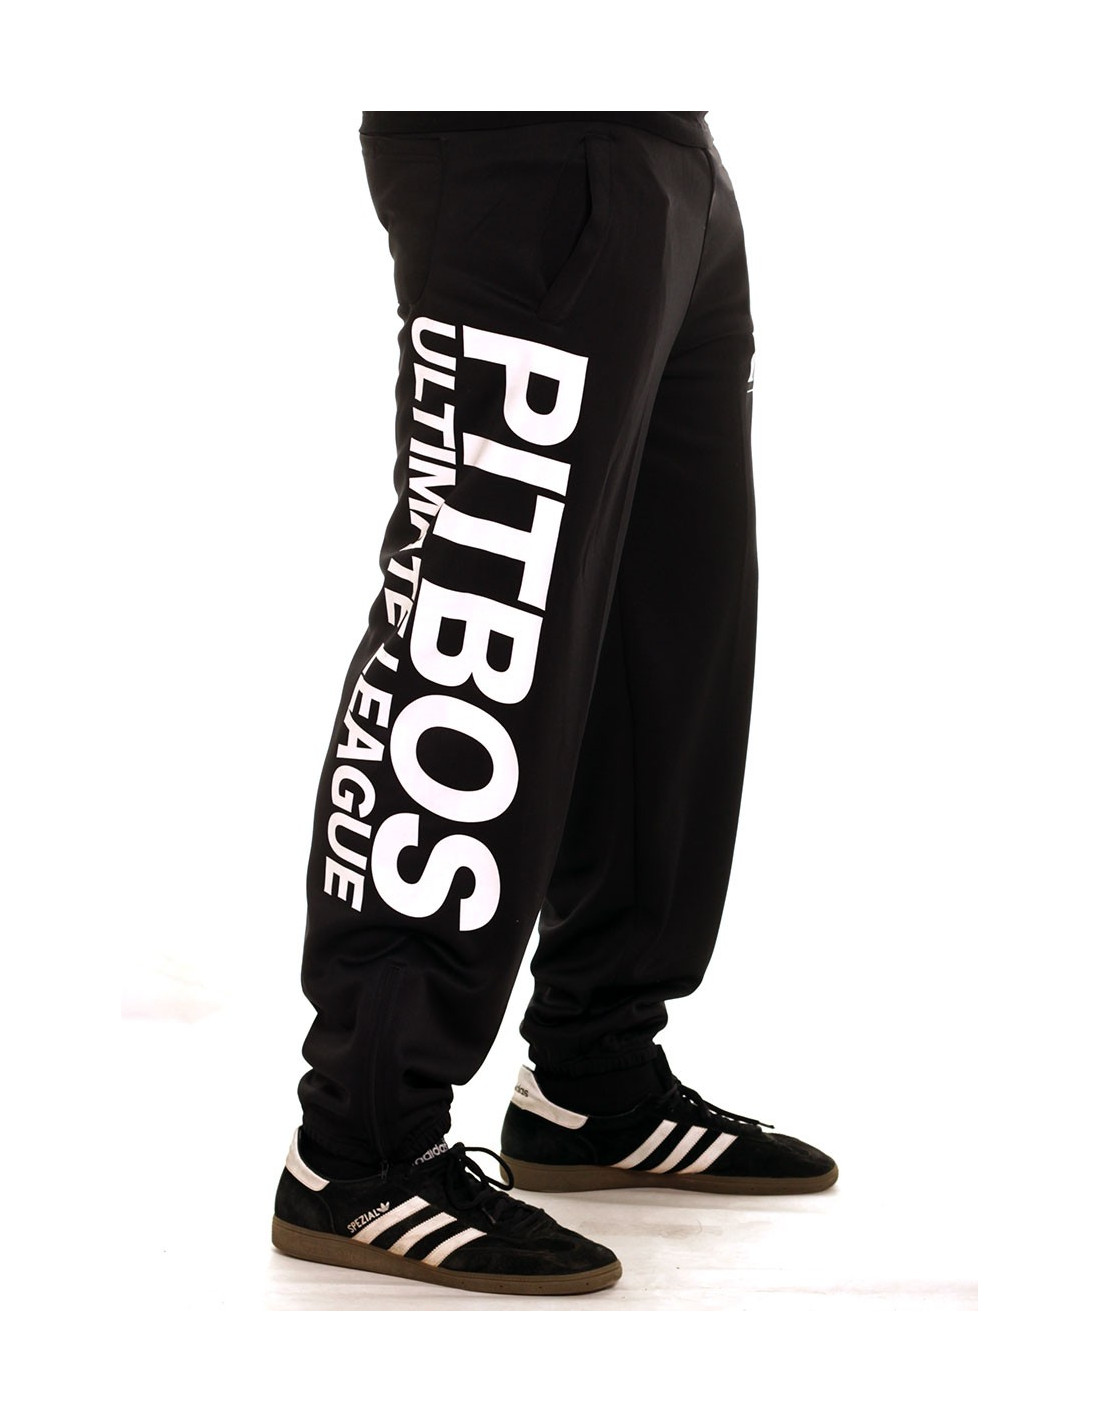 Pitbos Ultimate League Sweatpants BlackNWhite